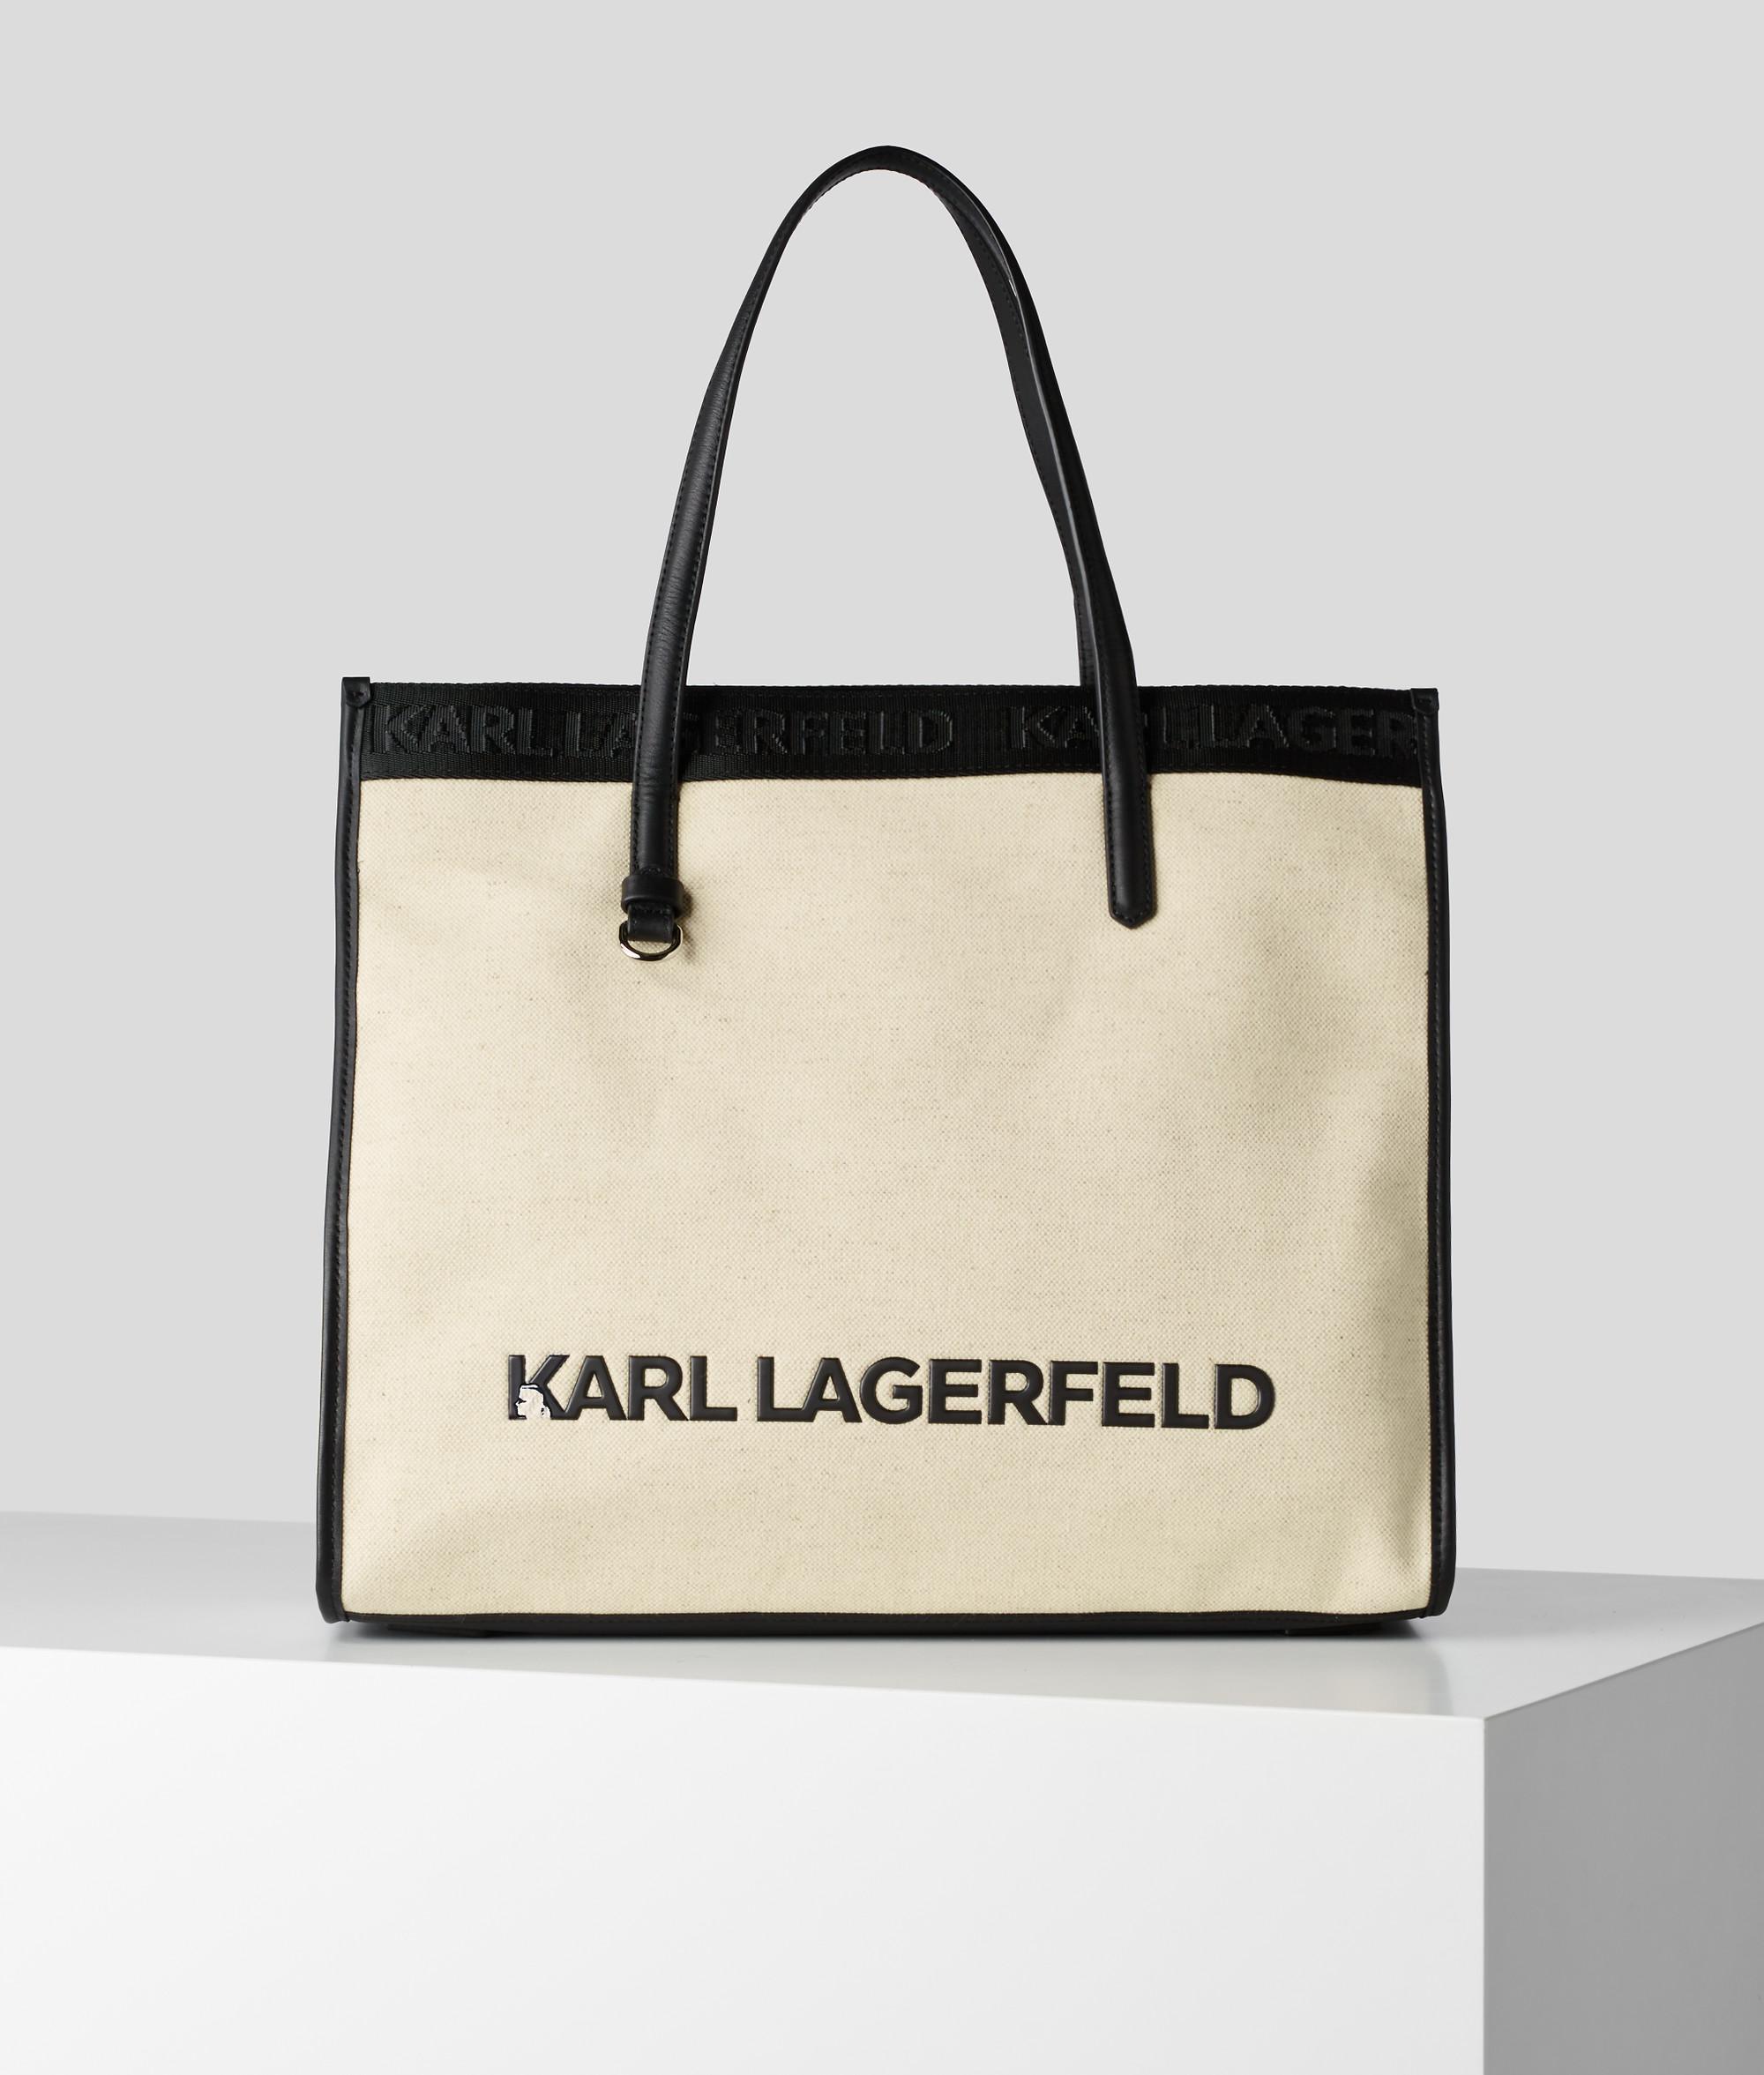 Karl Lagerfeld Skuare Canvas Tote shopper